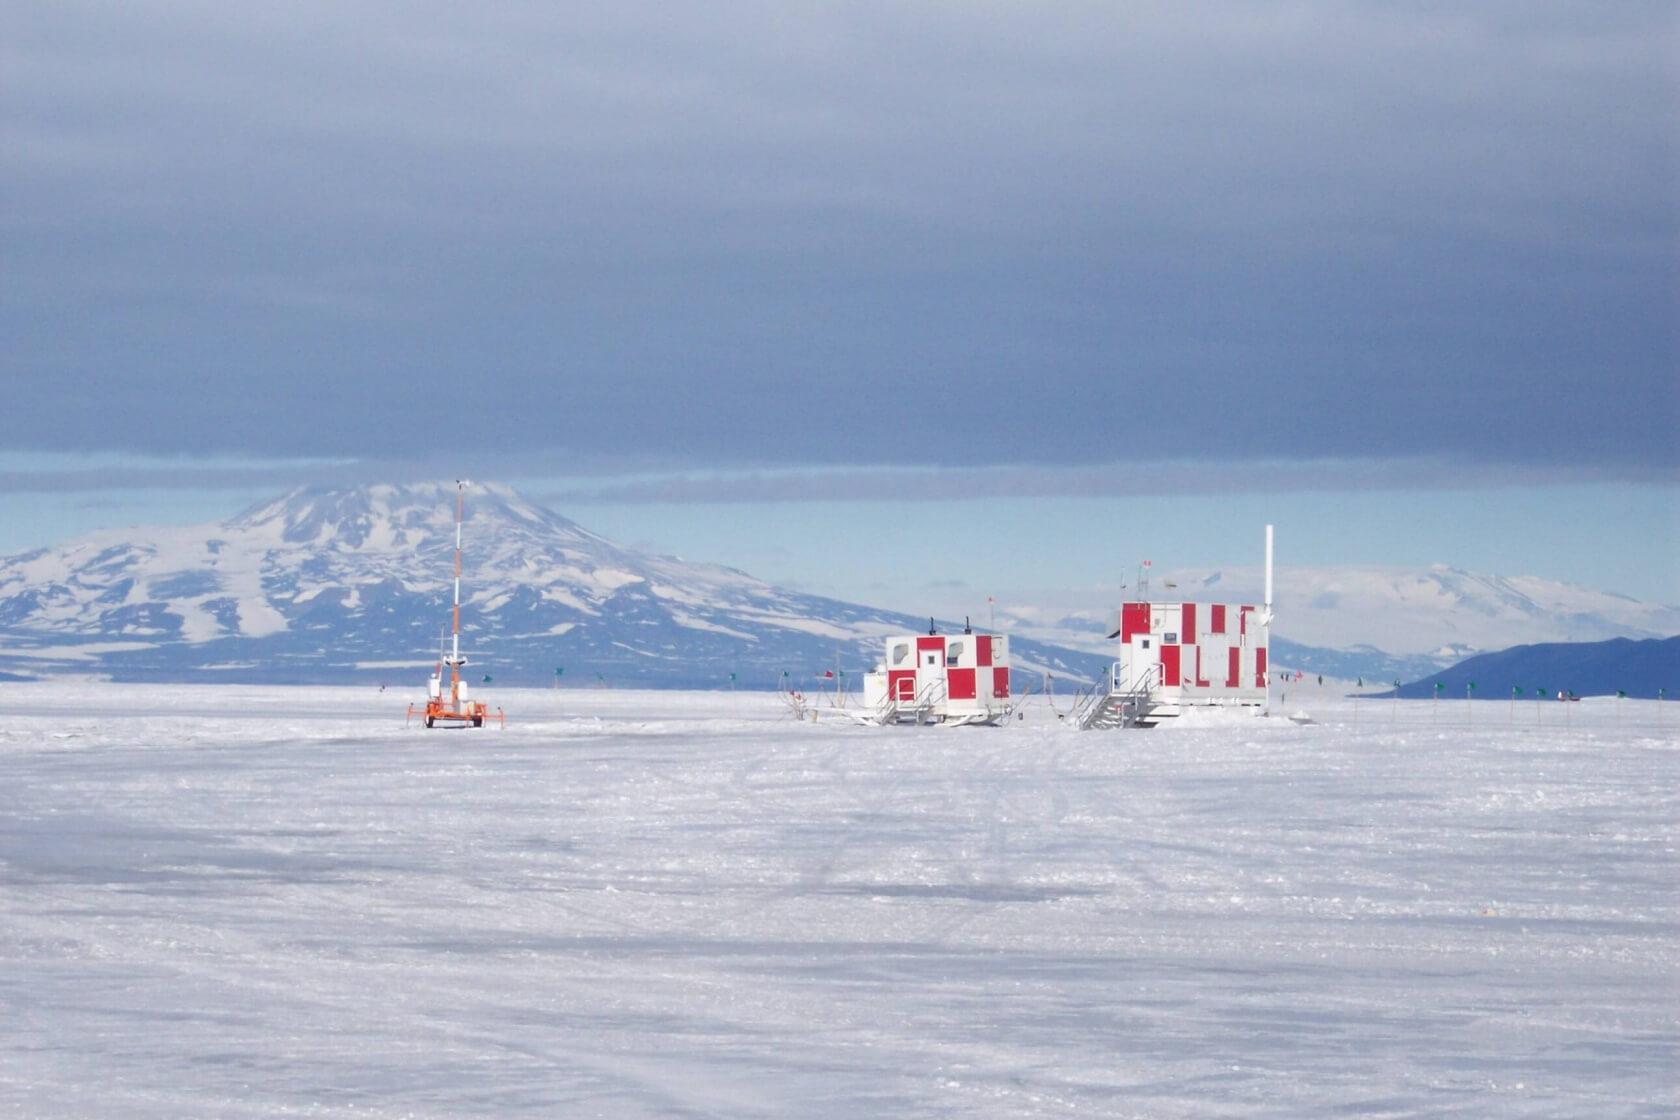 U.S.-Navy-FM20-SS-Skid-System-Antarctica-Airfield-e1432080862975